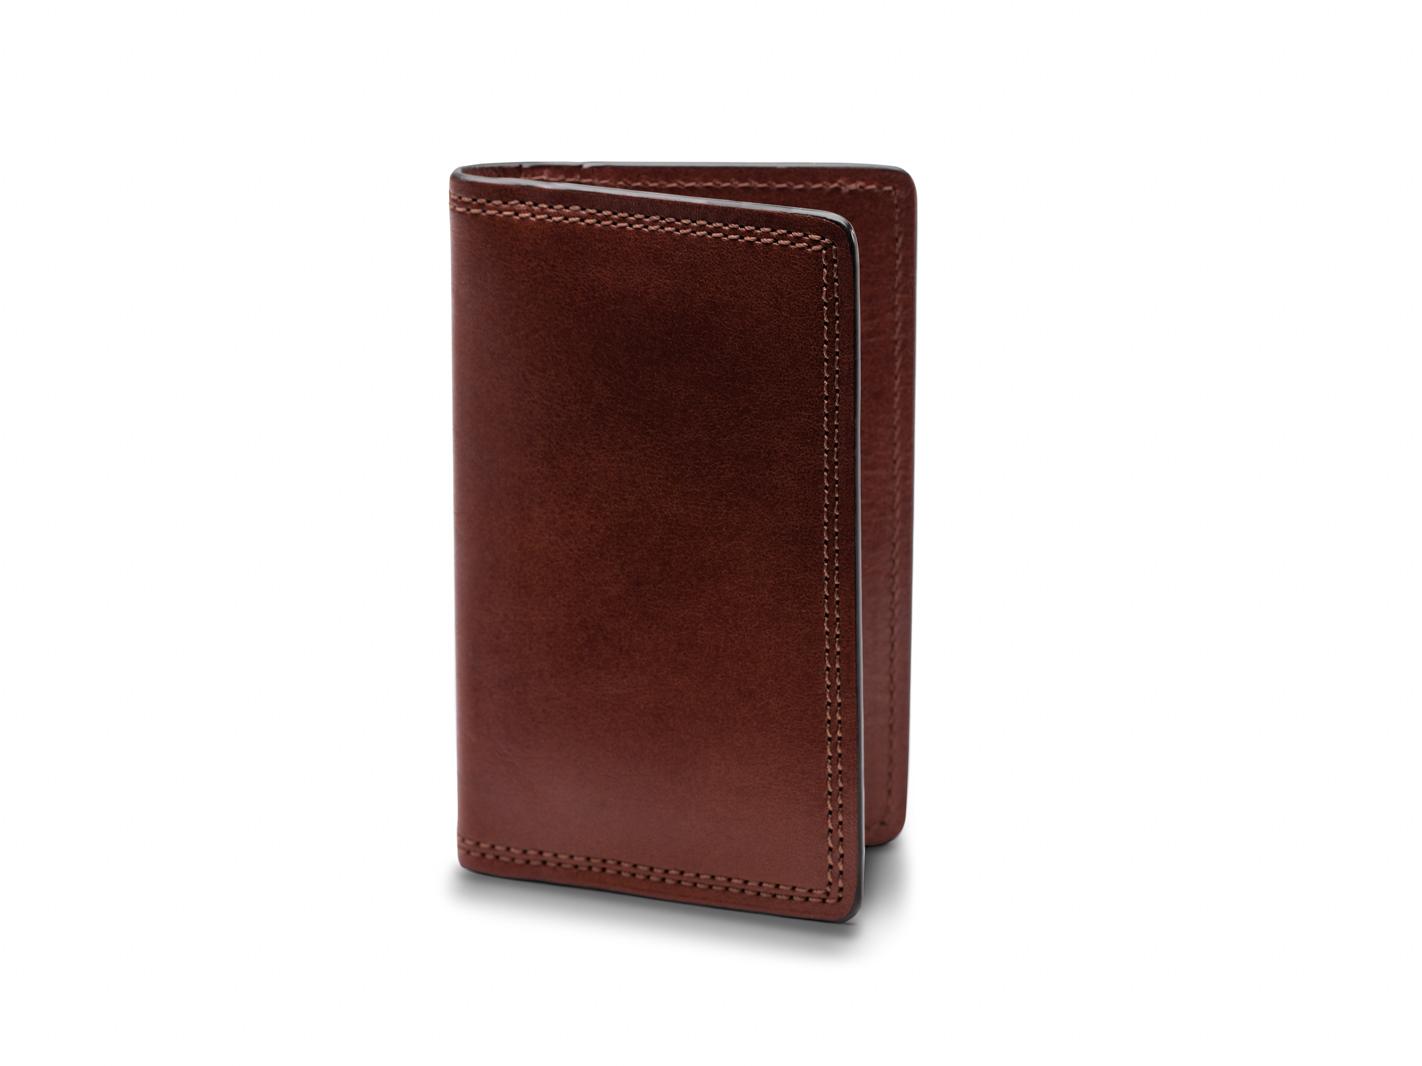 Calling Card Case-218 Dark Brown - 218 Dark Brown